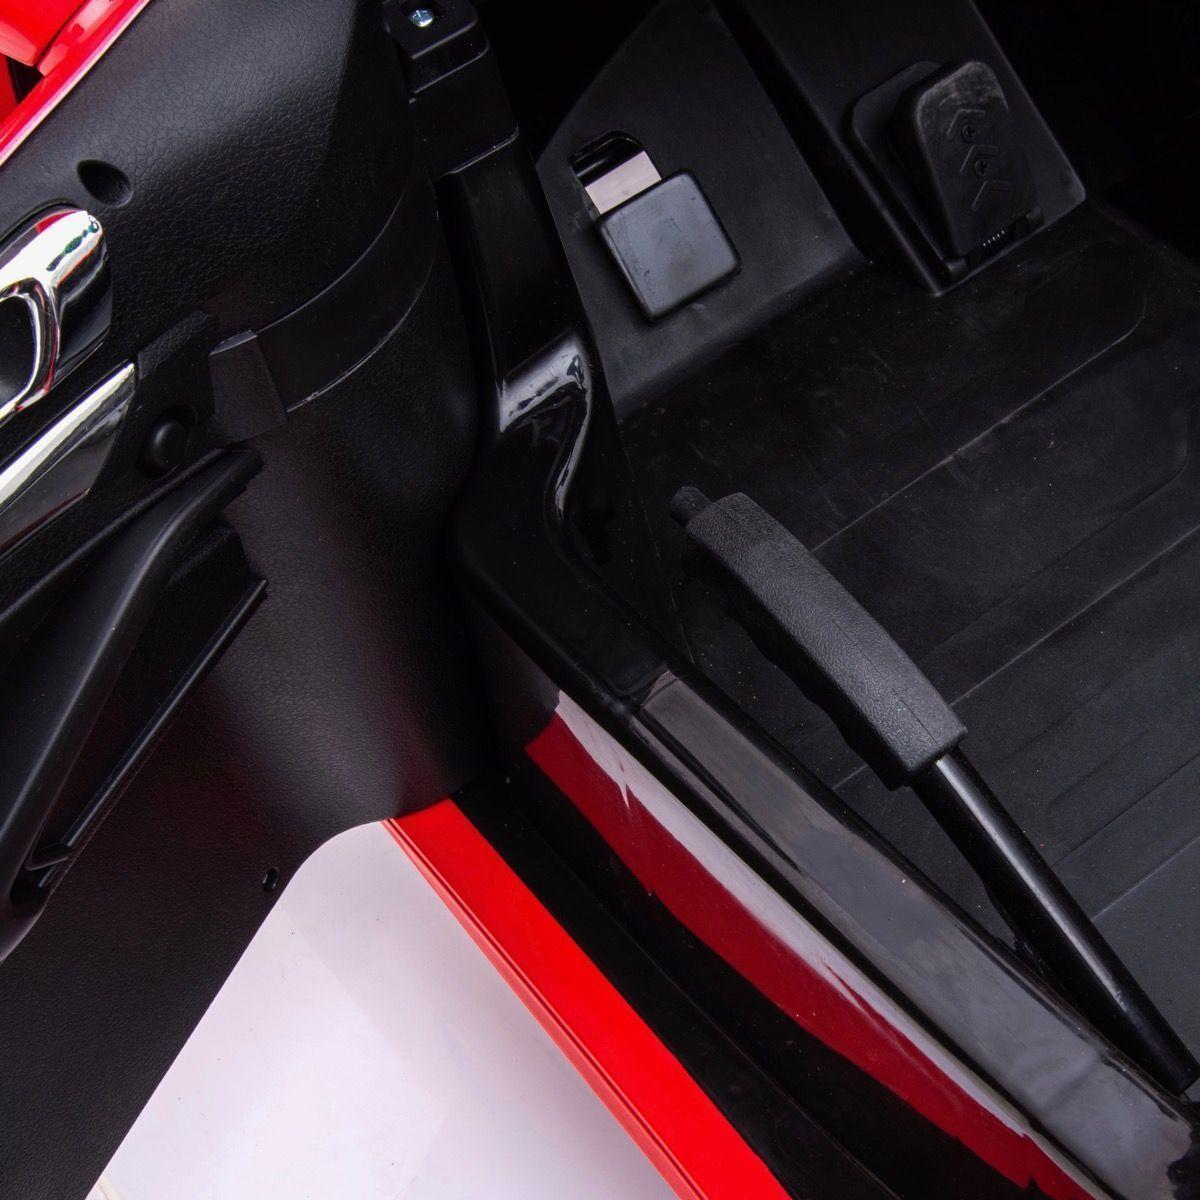 Deportivo Pekecars XL 24V Rojo - puerta